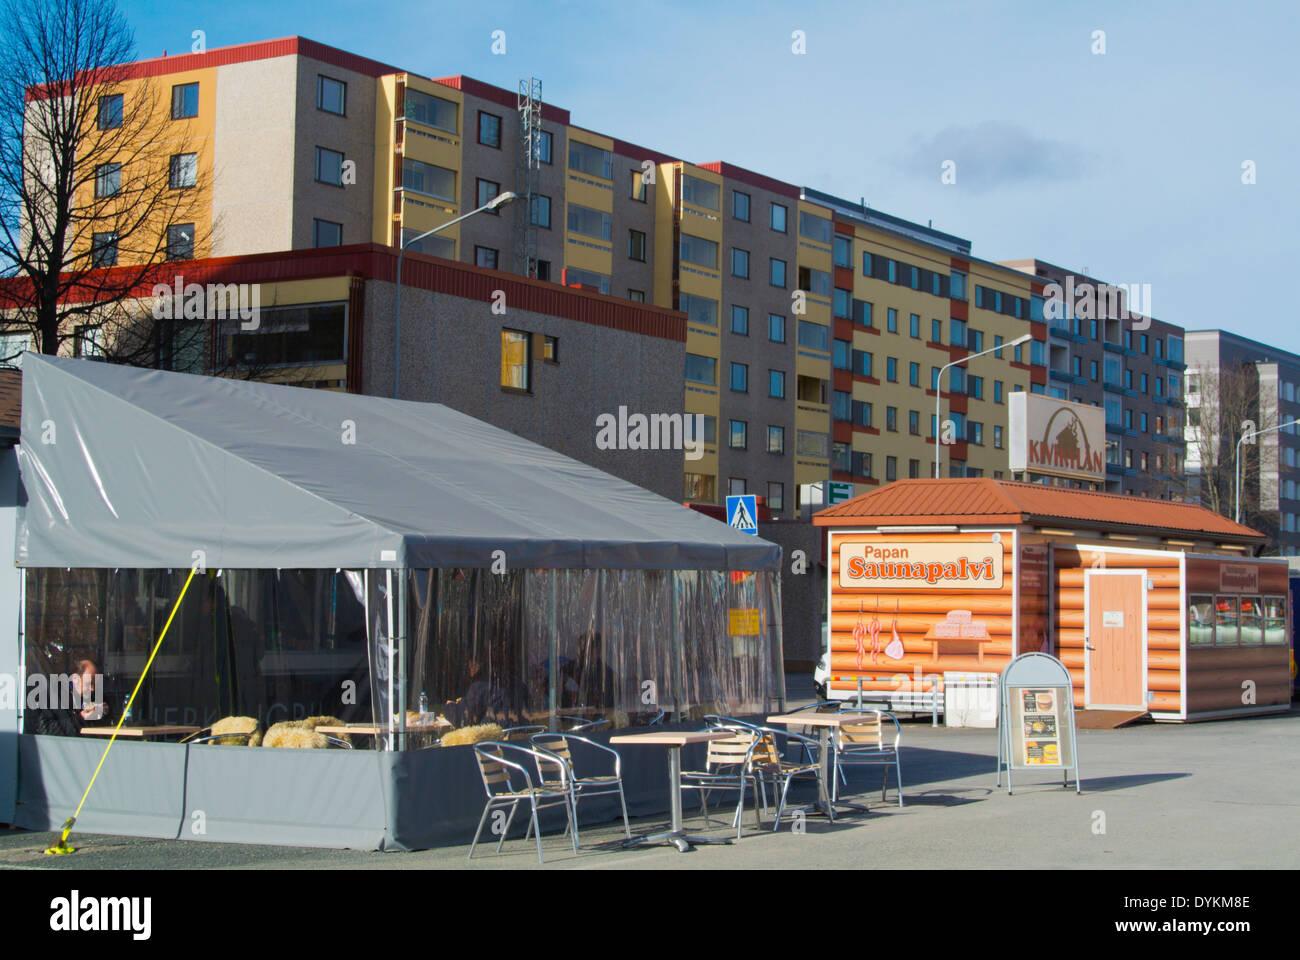 Tammelan Apteekki Tampere